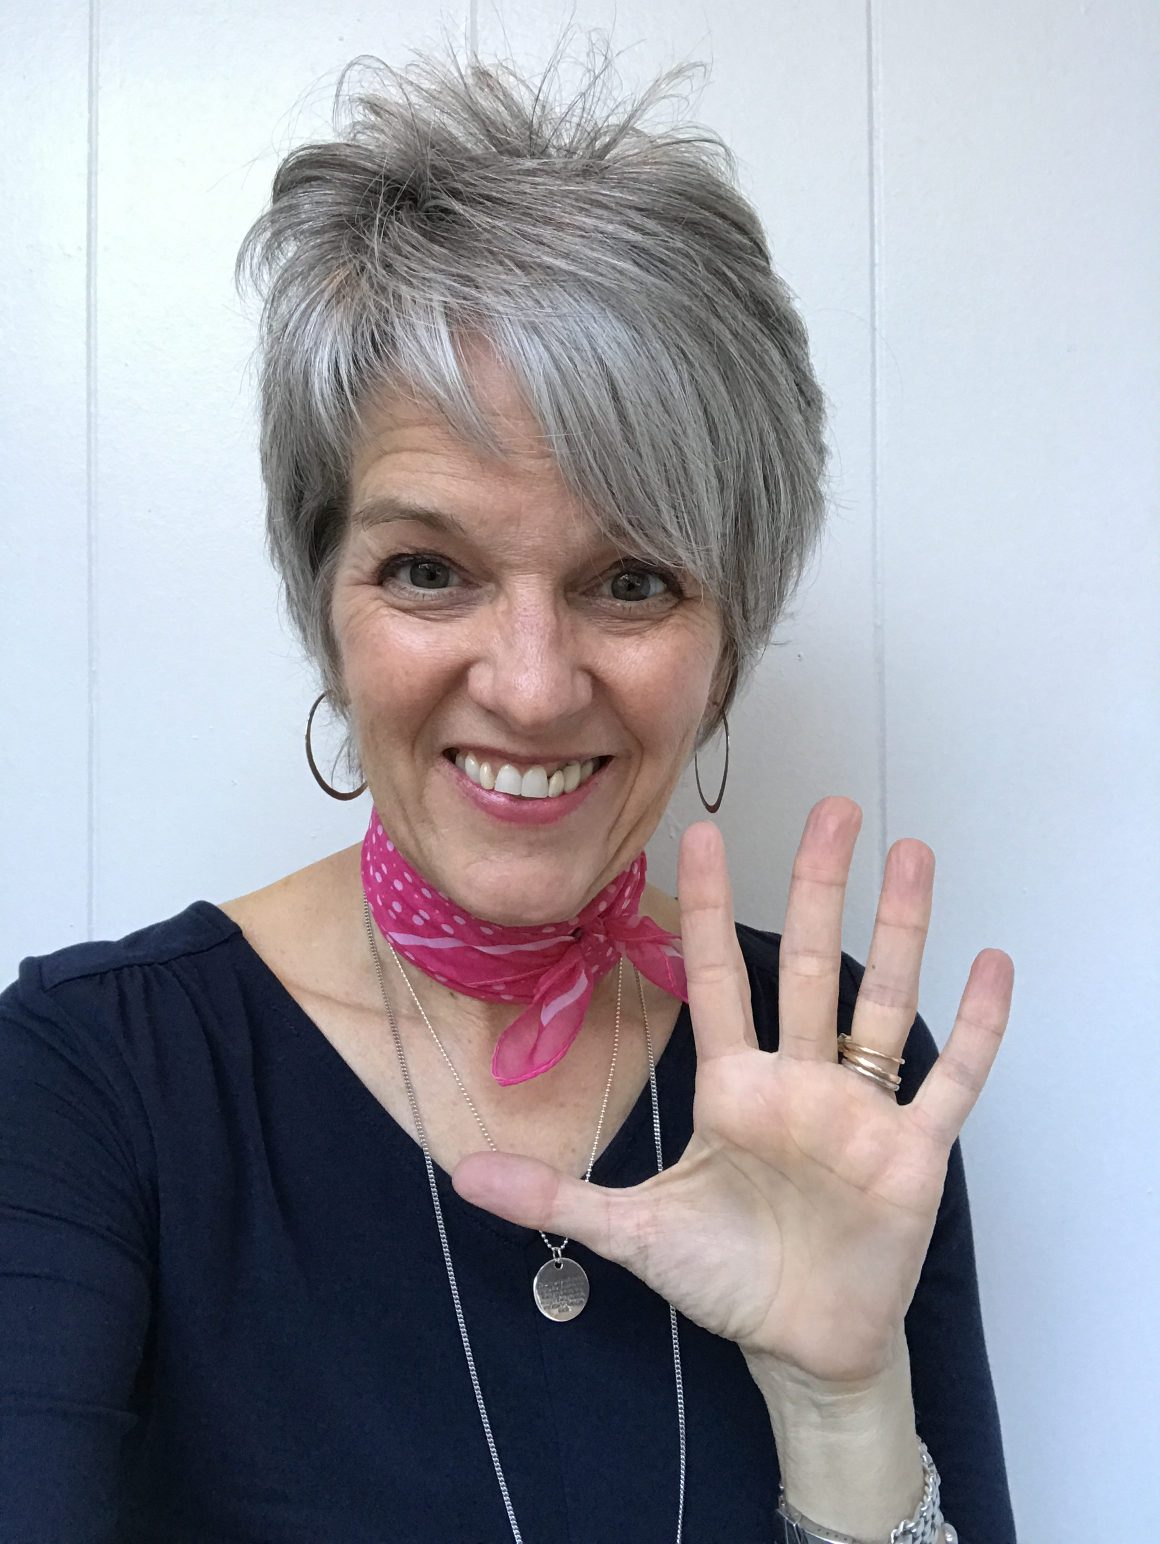 Woman Showing 5 Fingers Open Hand